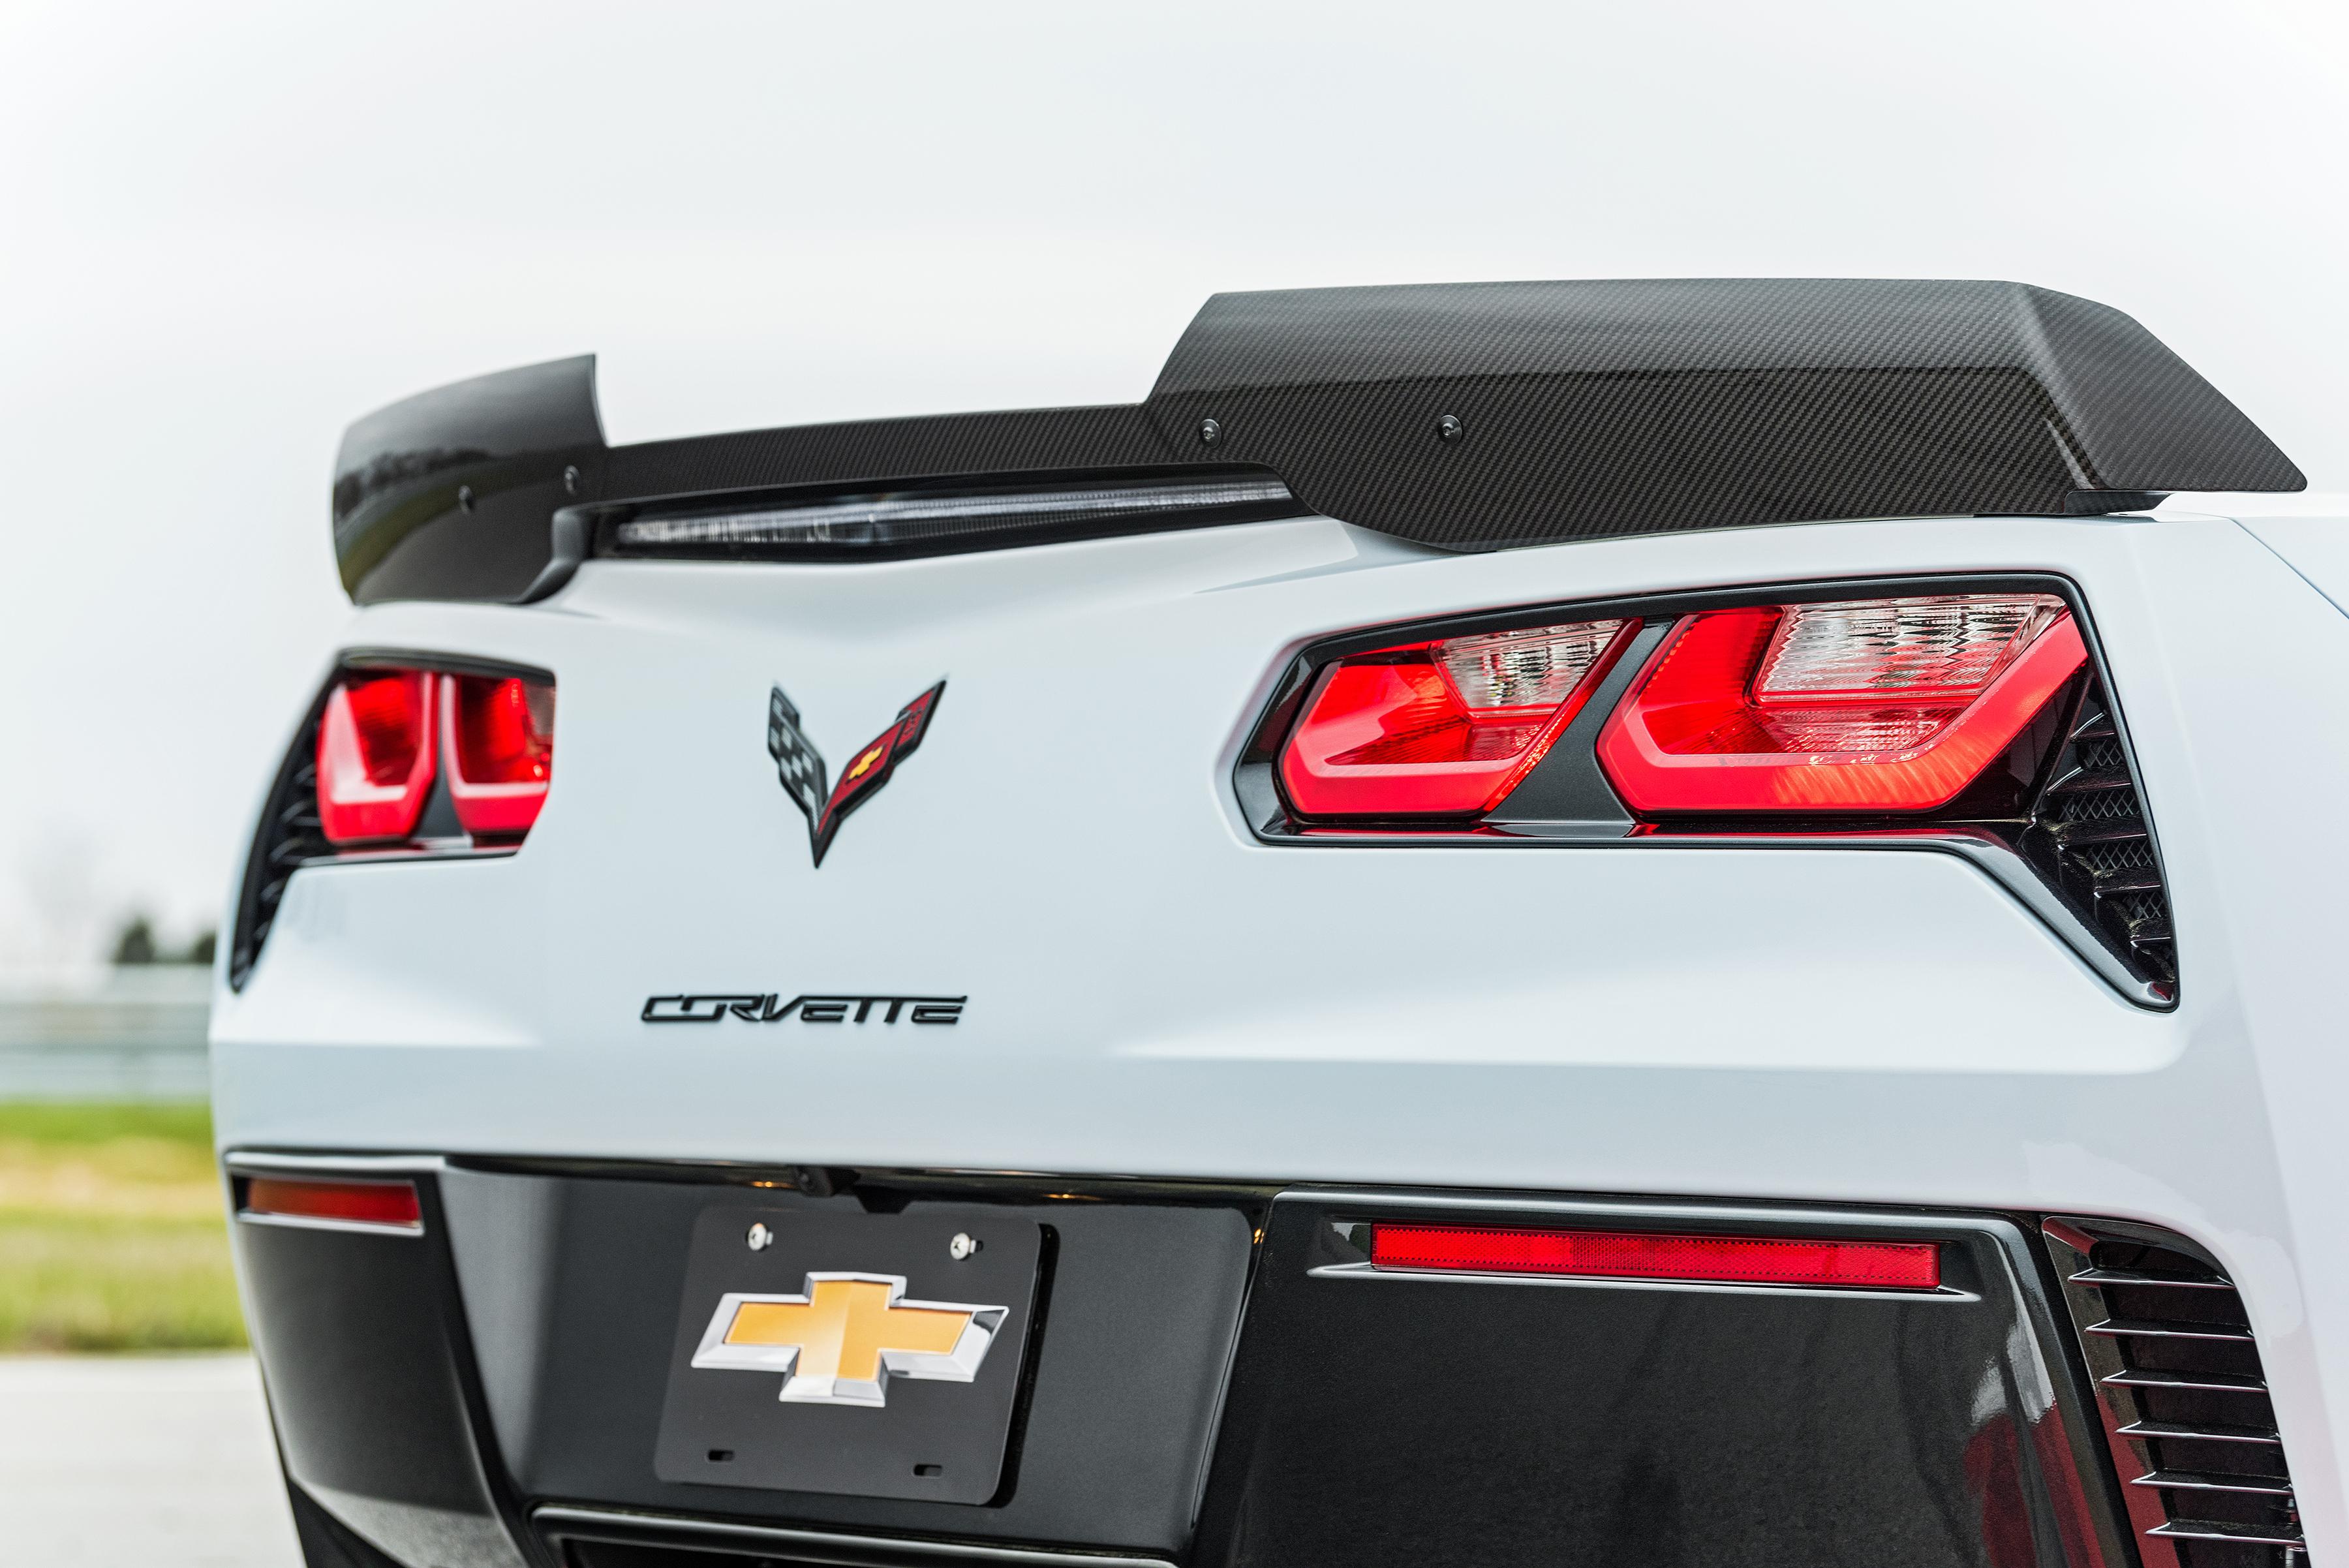 Chevrolet Corvette Carbon 65 Edition Marks Milestone 1954 Chevy Stingray